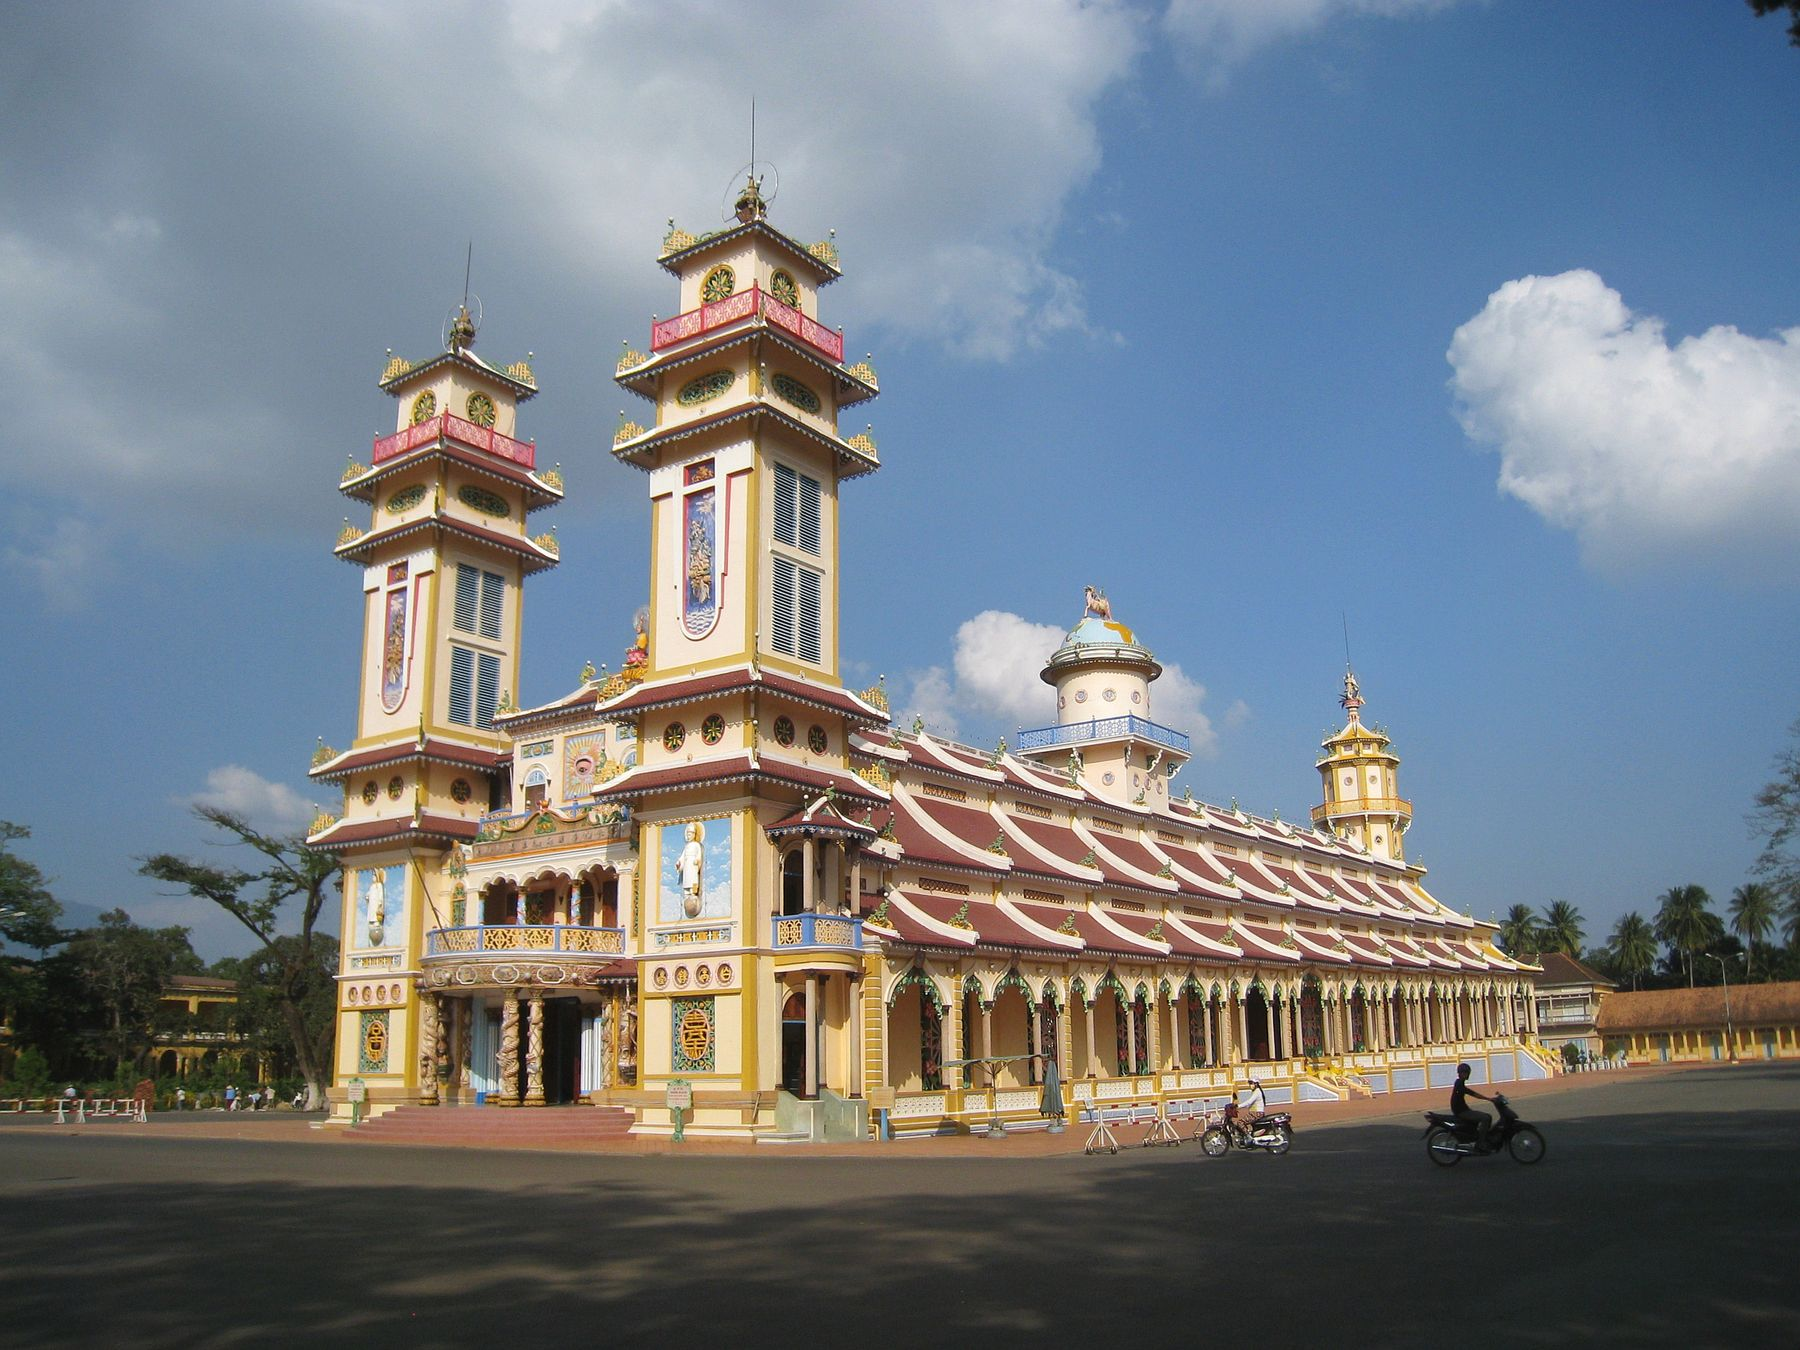 Cao Dai Temple. Вьетнам пейзаж скалы дюны песок